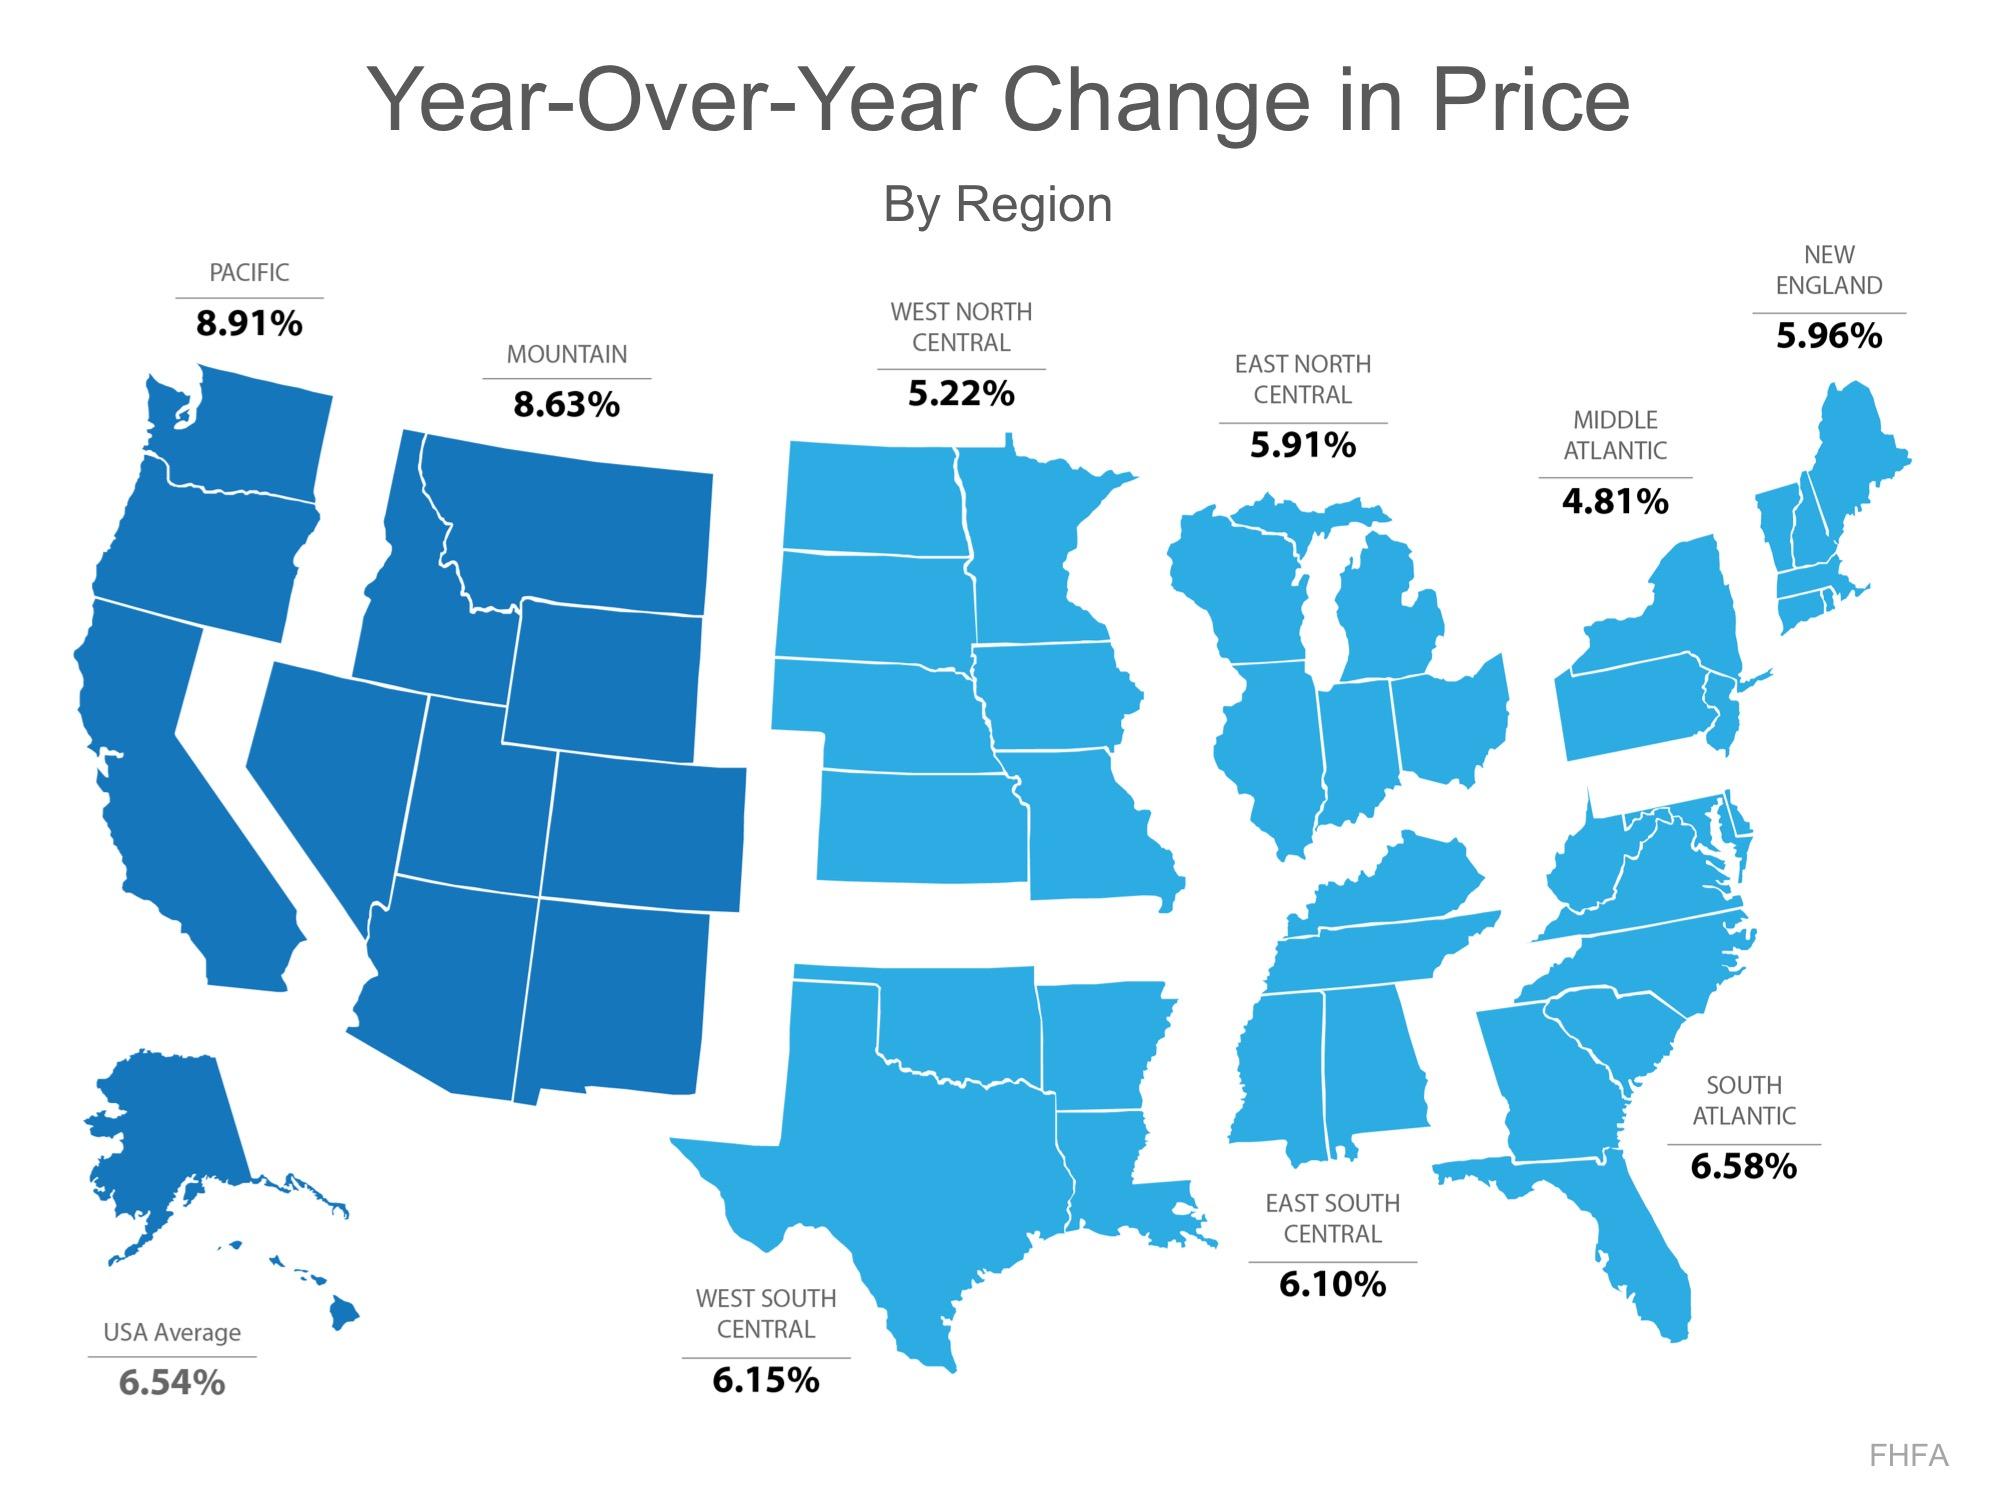 Regional YOY Price Change